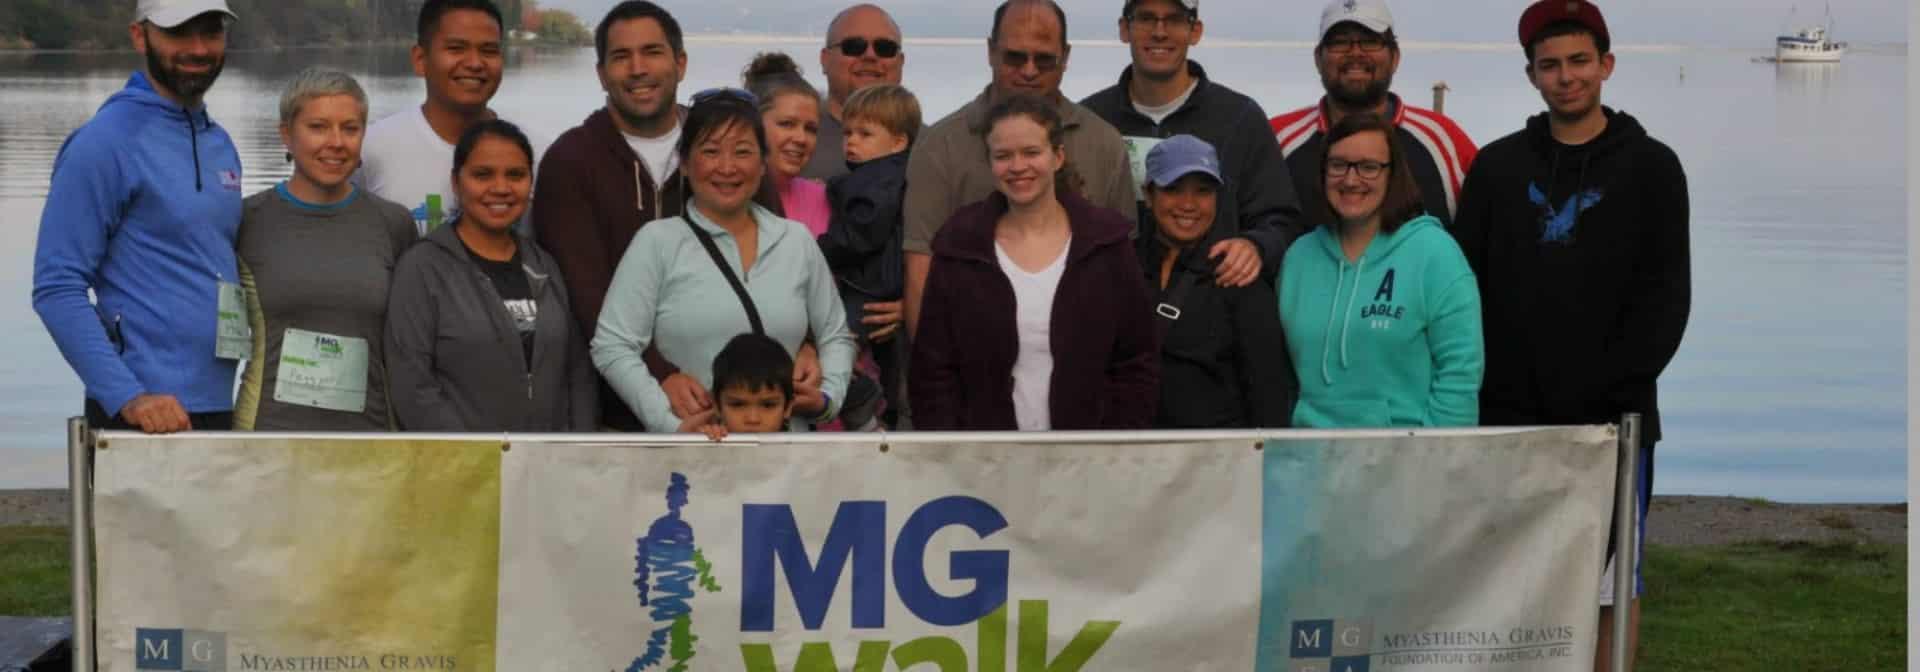 Seattle MG Walk 2015